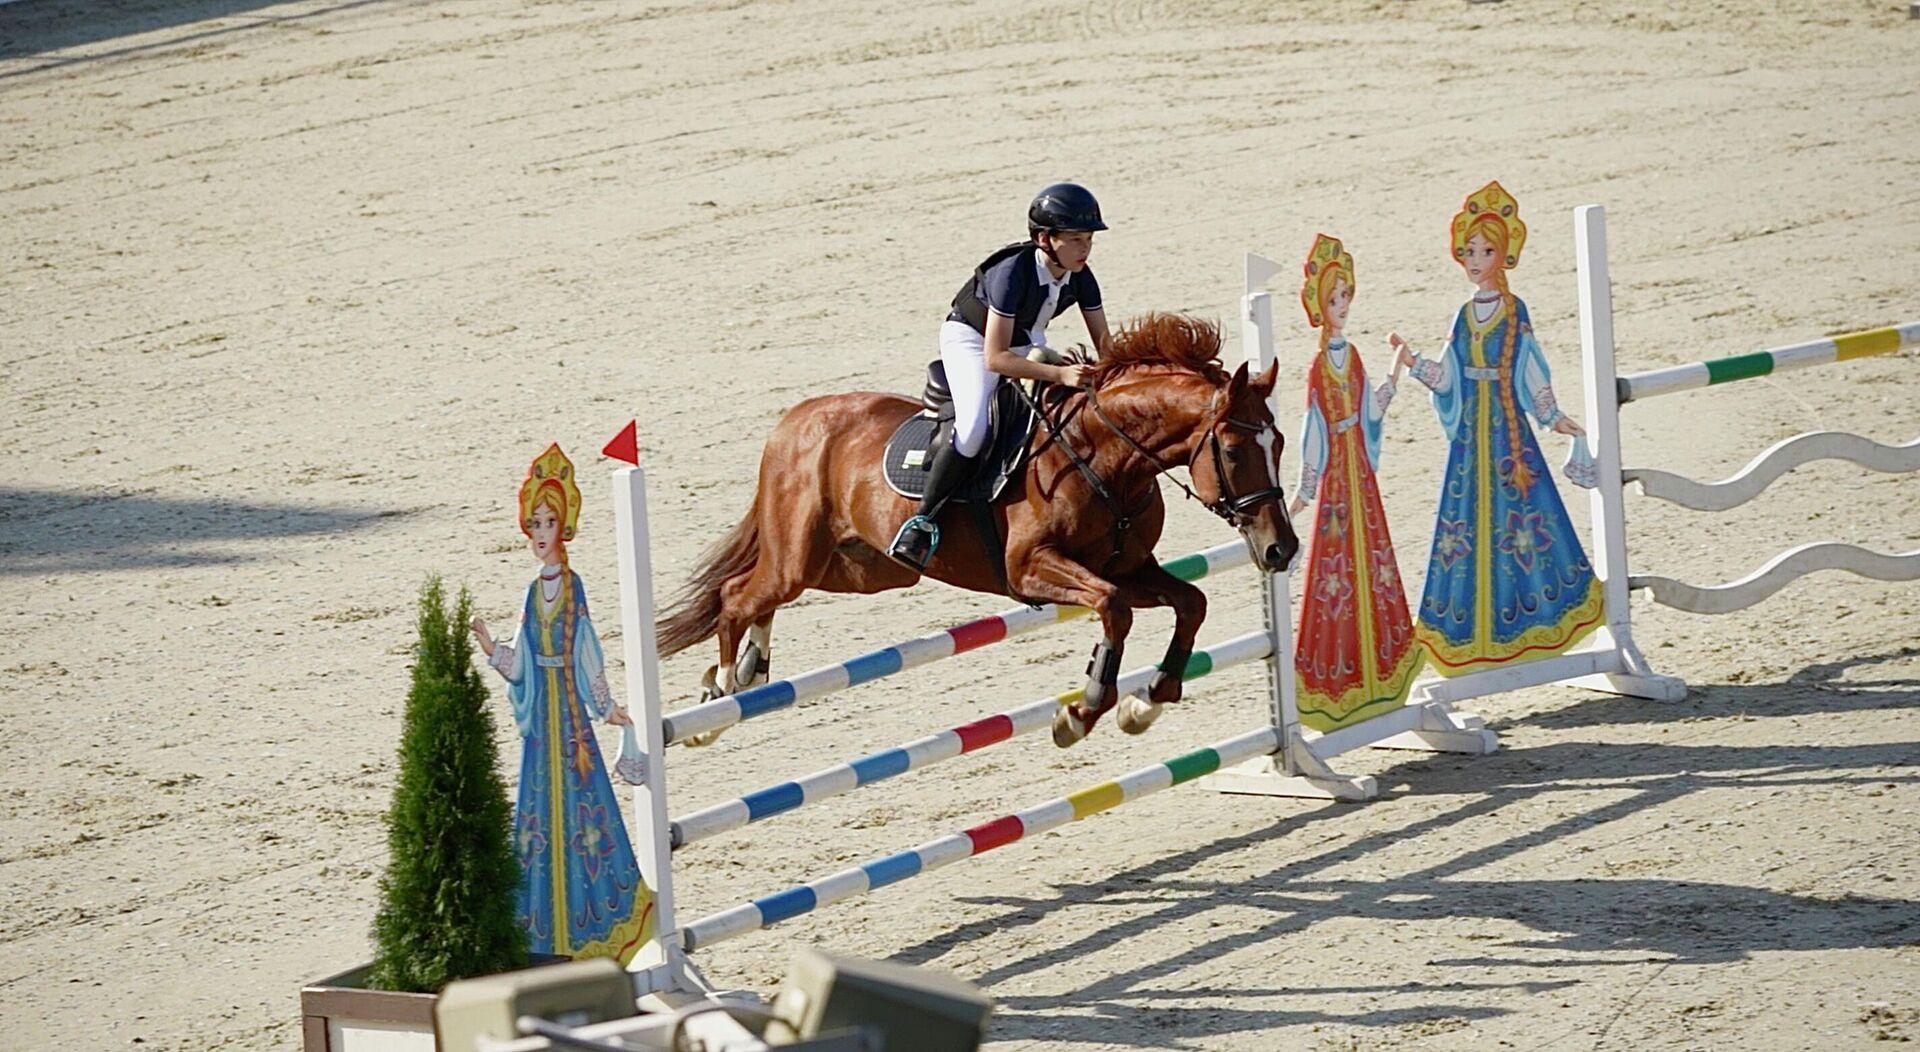 Соревнованию по конному спорту в Узбекистане - Sputnik Узбекистан, 1920, 28.06.2021